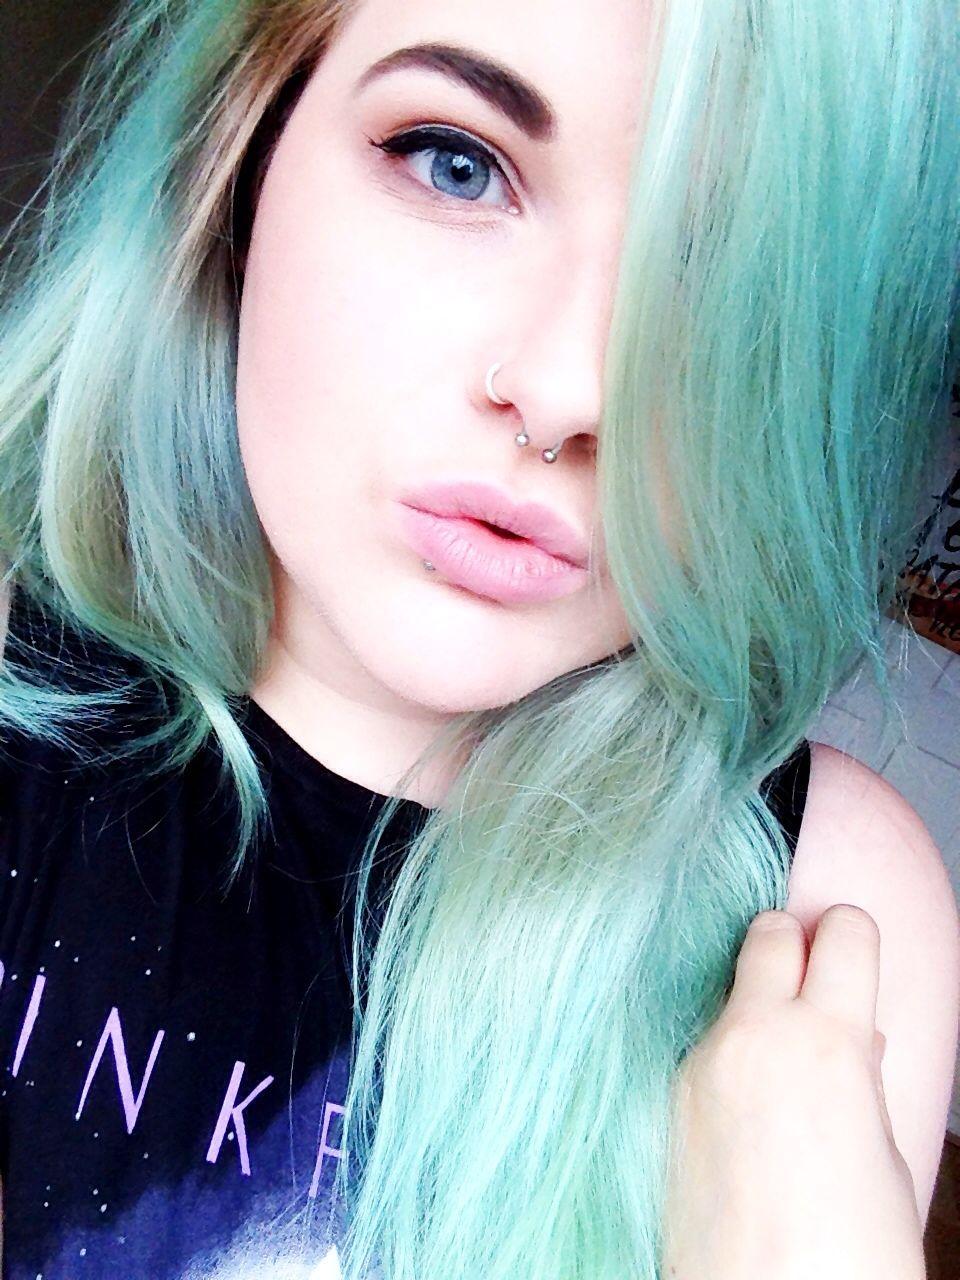 Mint Green Pastel Hair Color For Fair Skin Blue Eyes Pink Lips Miissmadhatter Green Hair Hair Colors For Blue Eyes Hair Color For Fair Skin